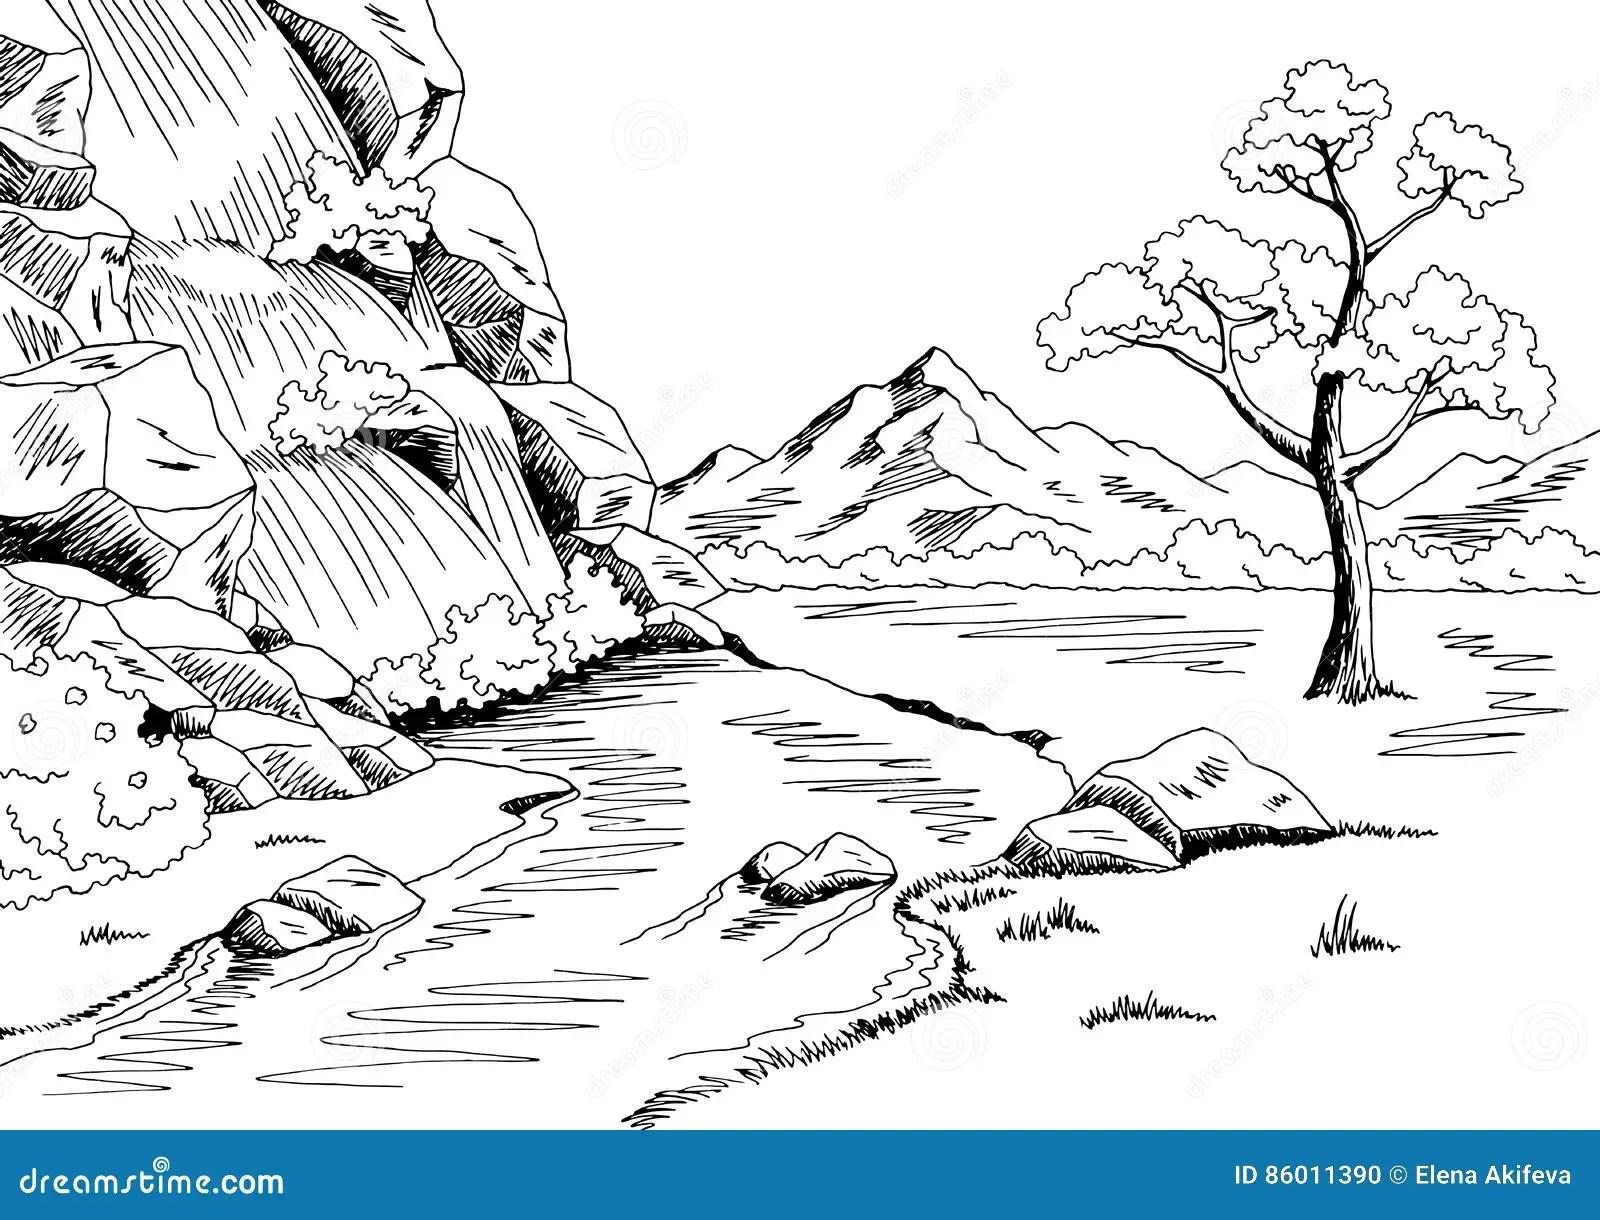 Waterfall Graphic Black White Landscape Sketch